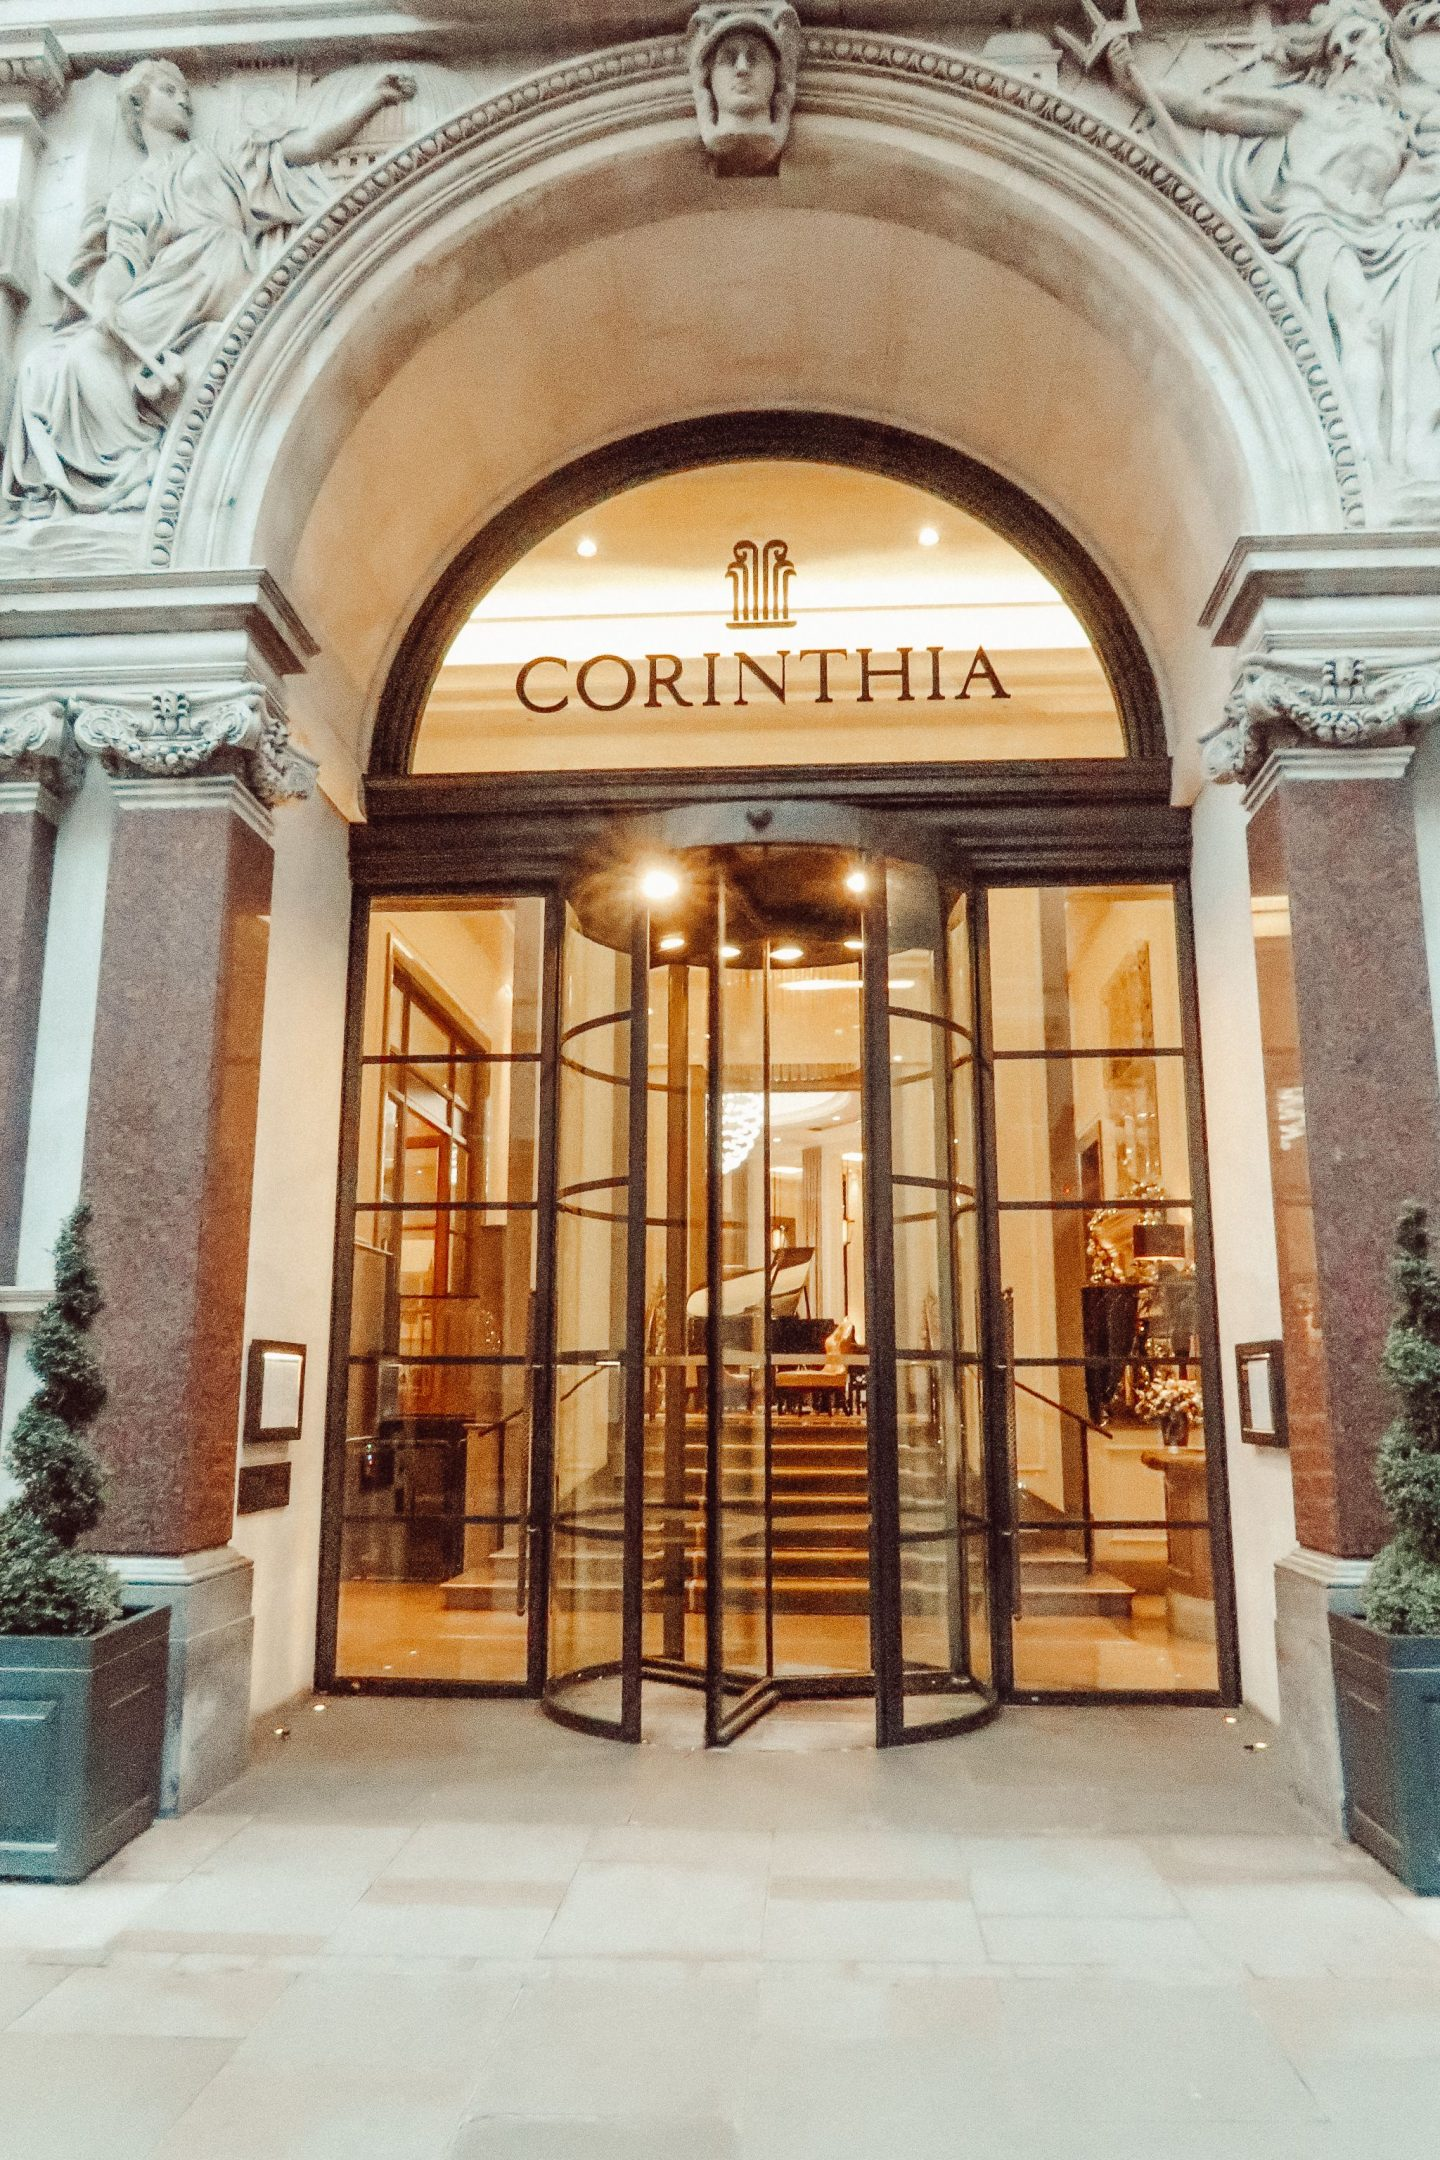 Afternoon Tea At The Corinthia, London